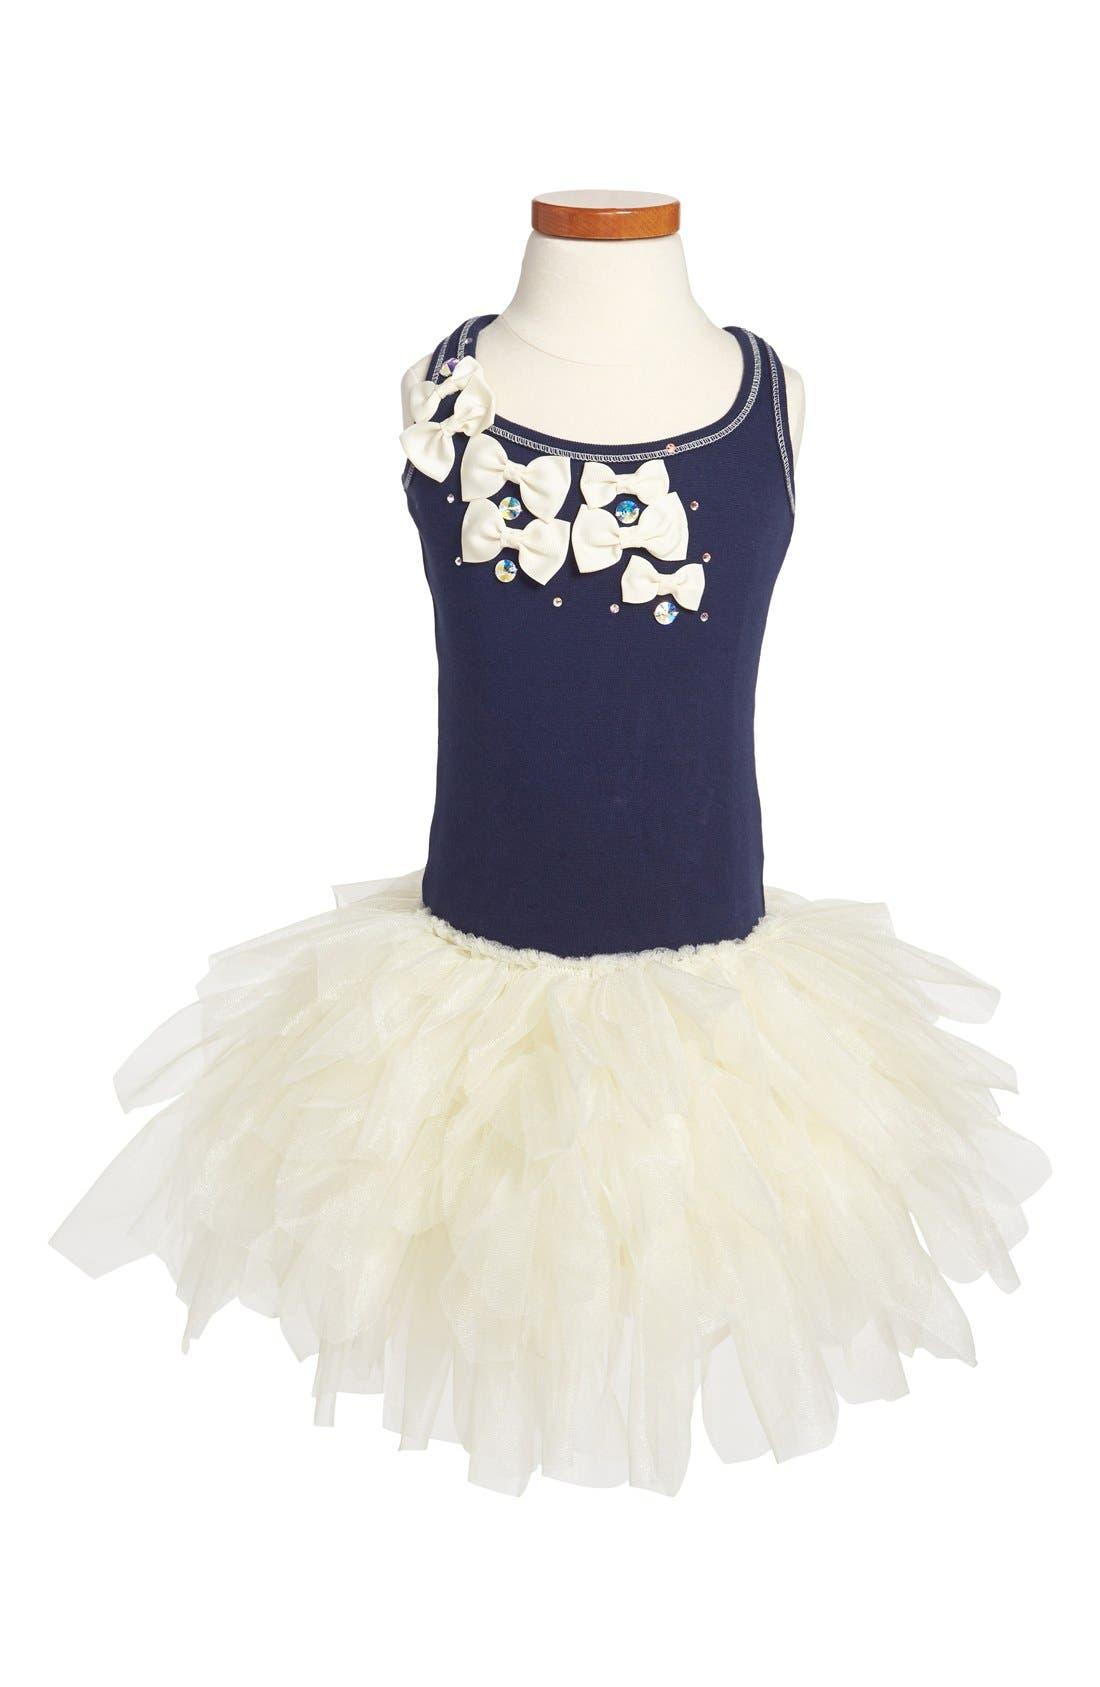 Main Image - Ooh! La, La! Couture 'Little Bow' Tulle Dress (Little Girls & Big Girls)